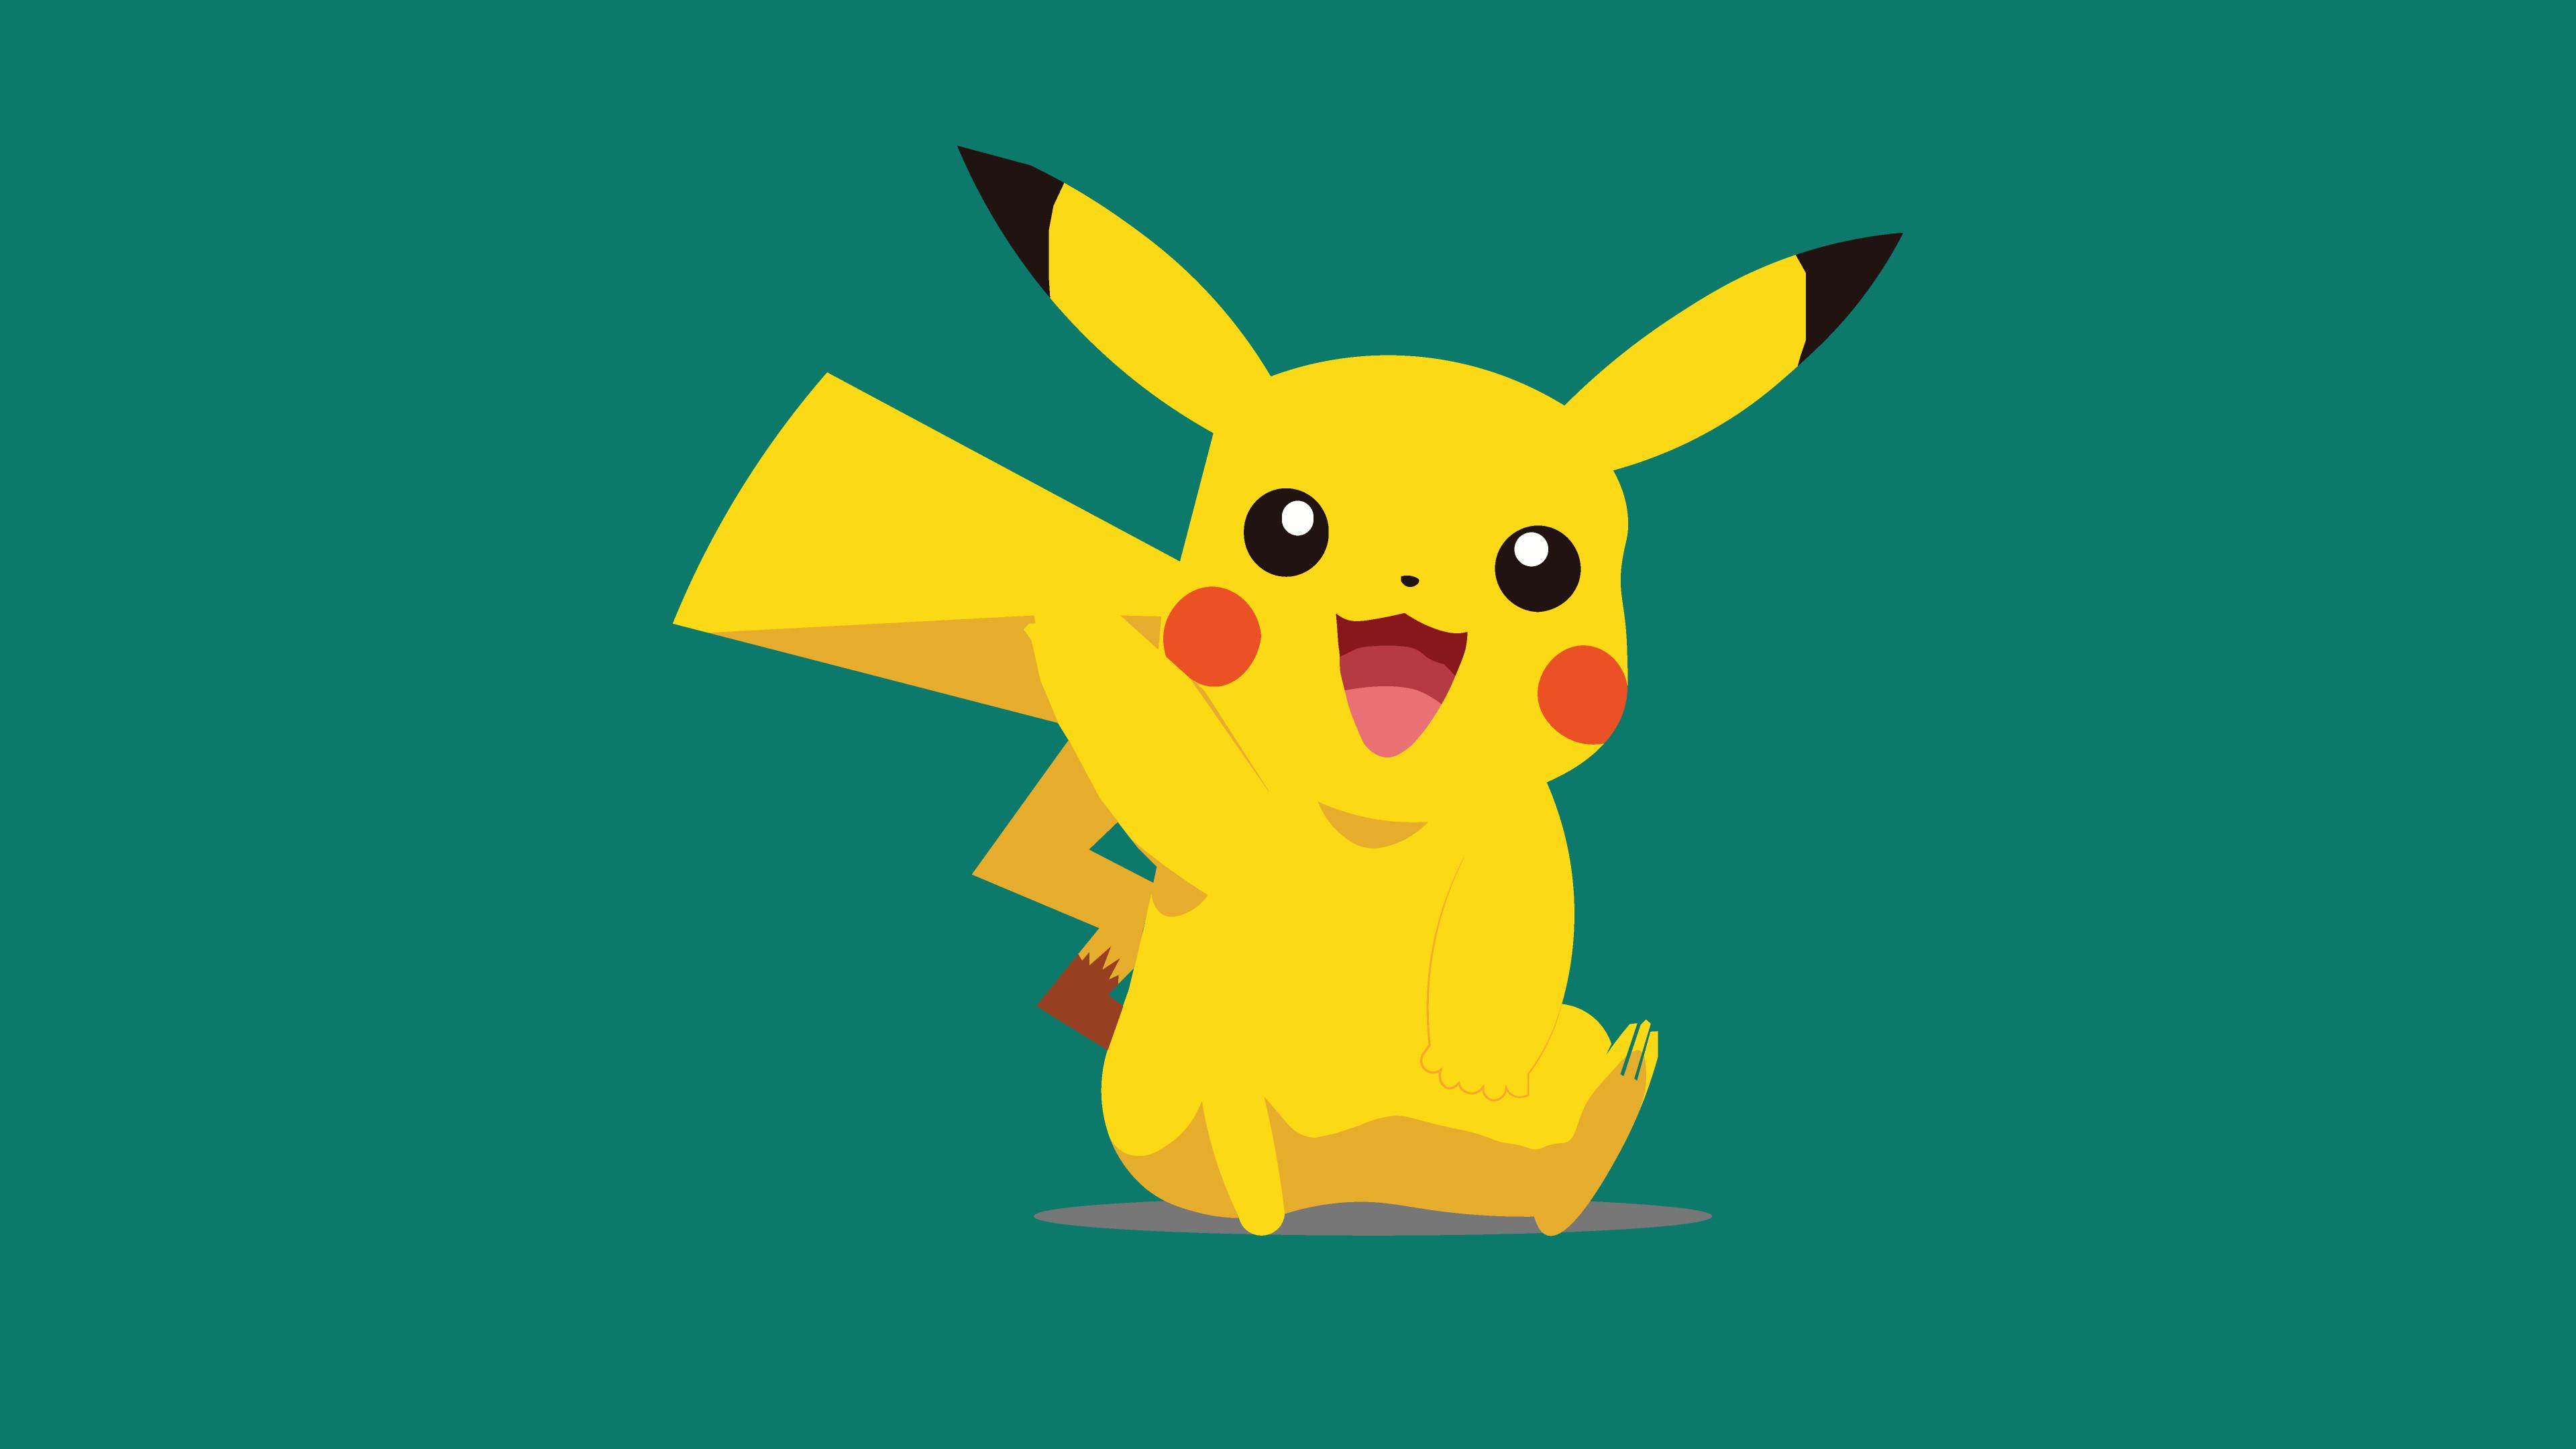 Pikachu Wallpaper 4k Pikachu Wallpaper 2016